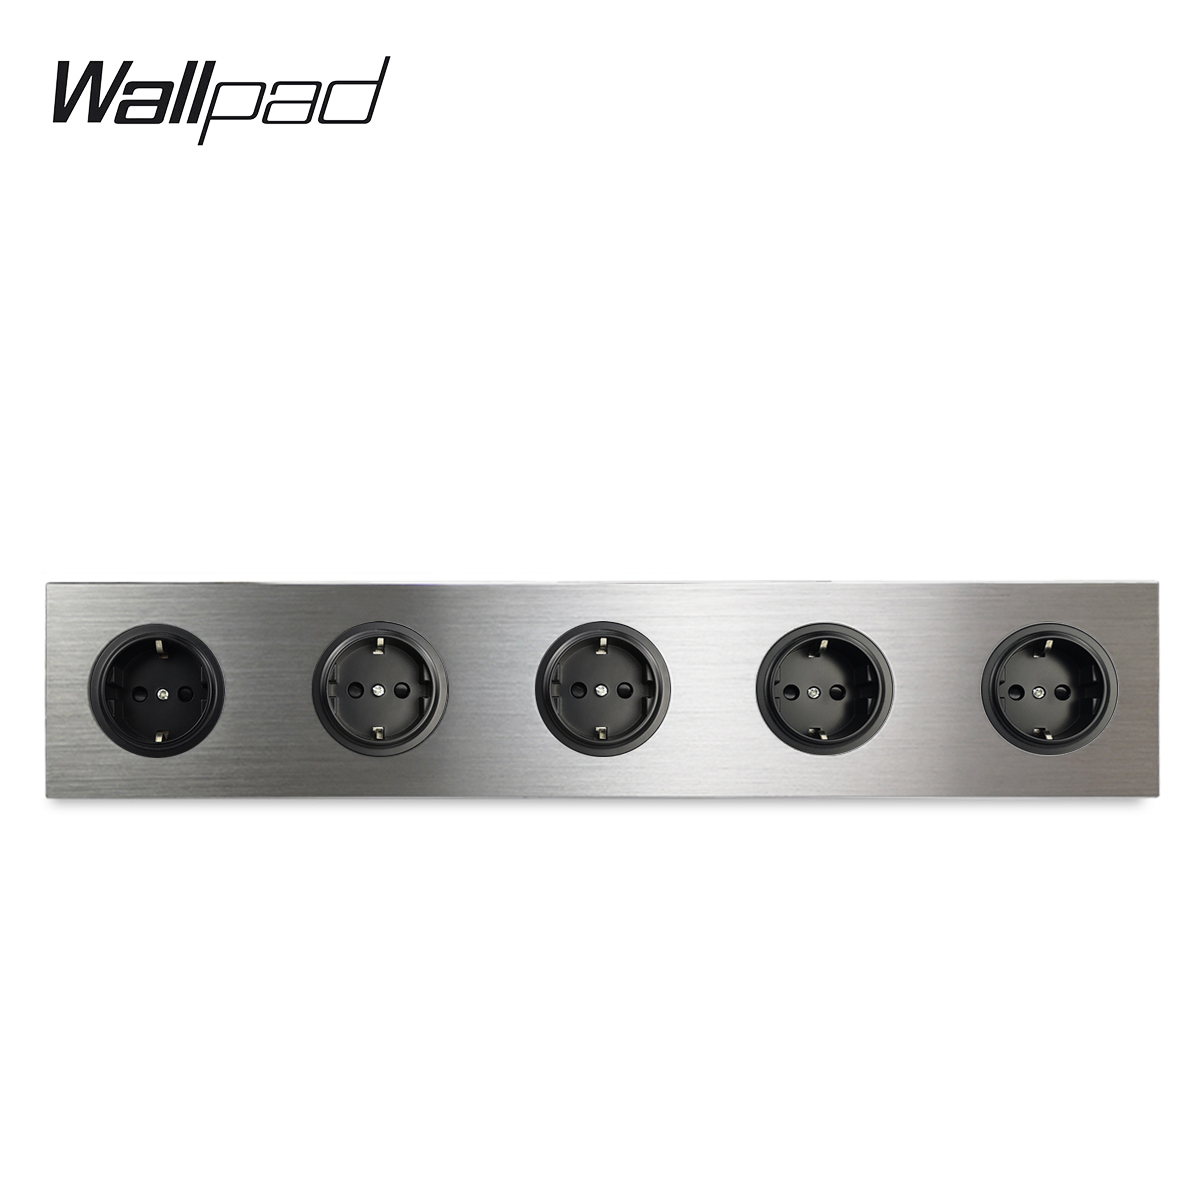 Wallpad 5 Gang Frame Quintuple EU Wall Electric Outlet Socket German Plug Silver Satin Brushed Aluminum Alloy Panel  430 * 86 mm